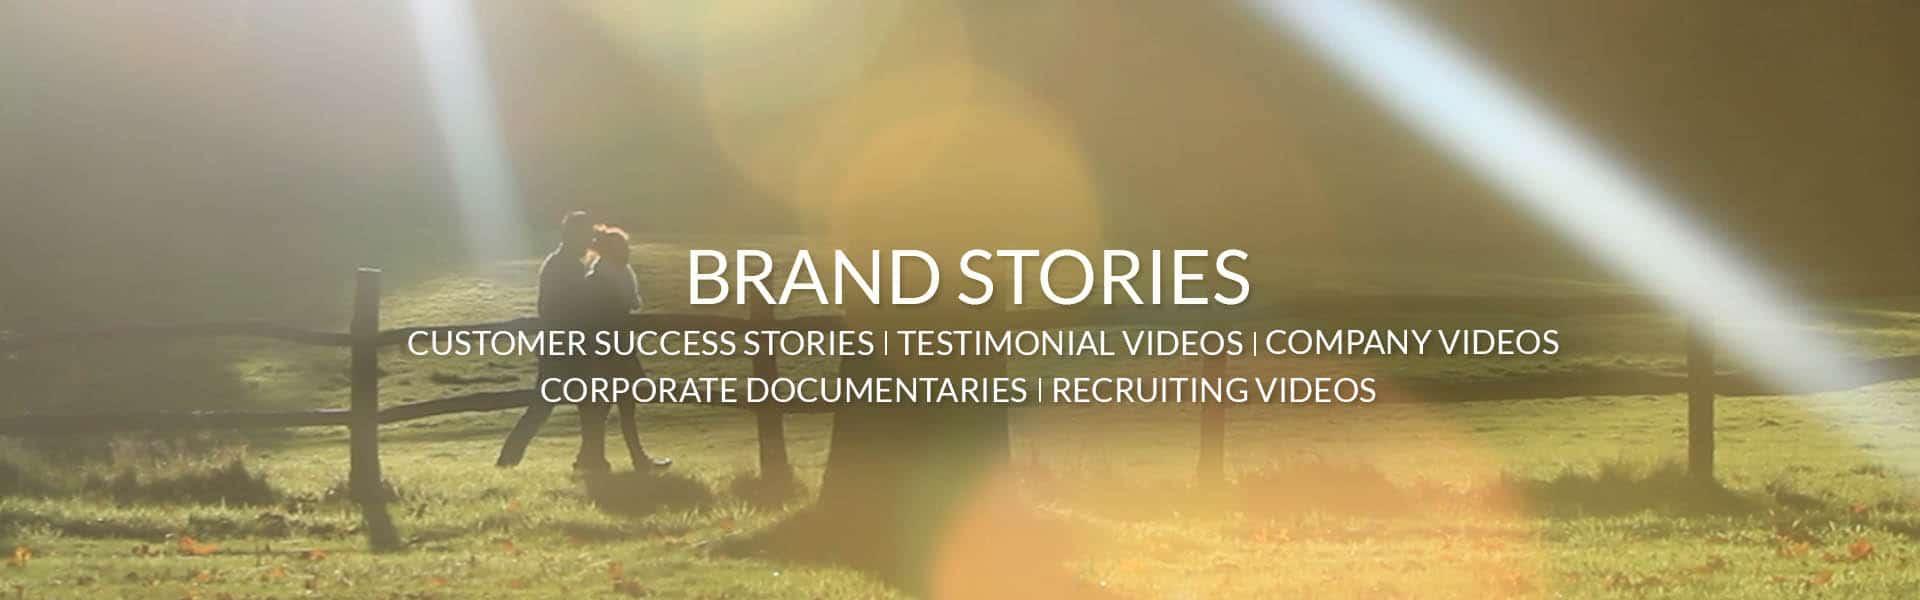 Brand Stories